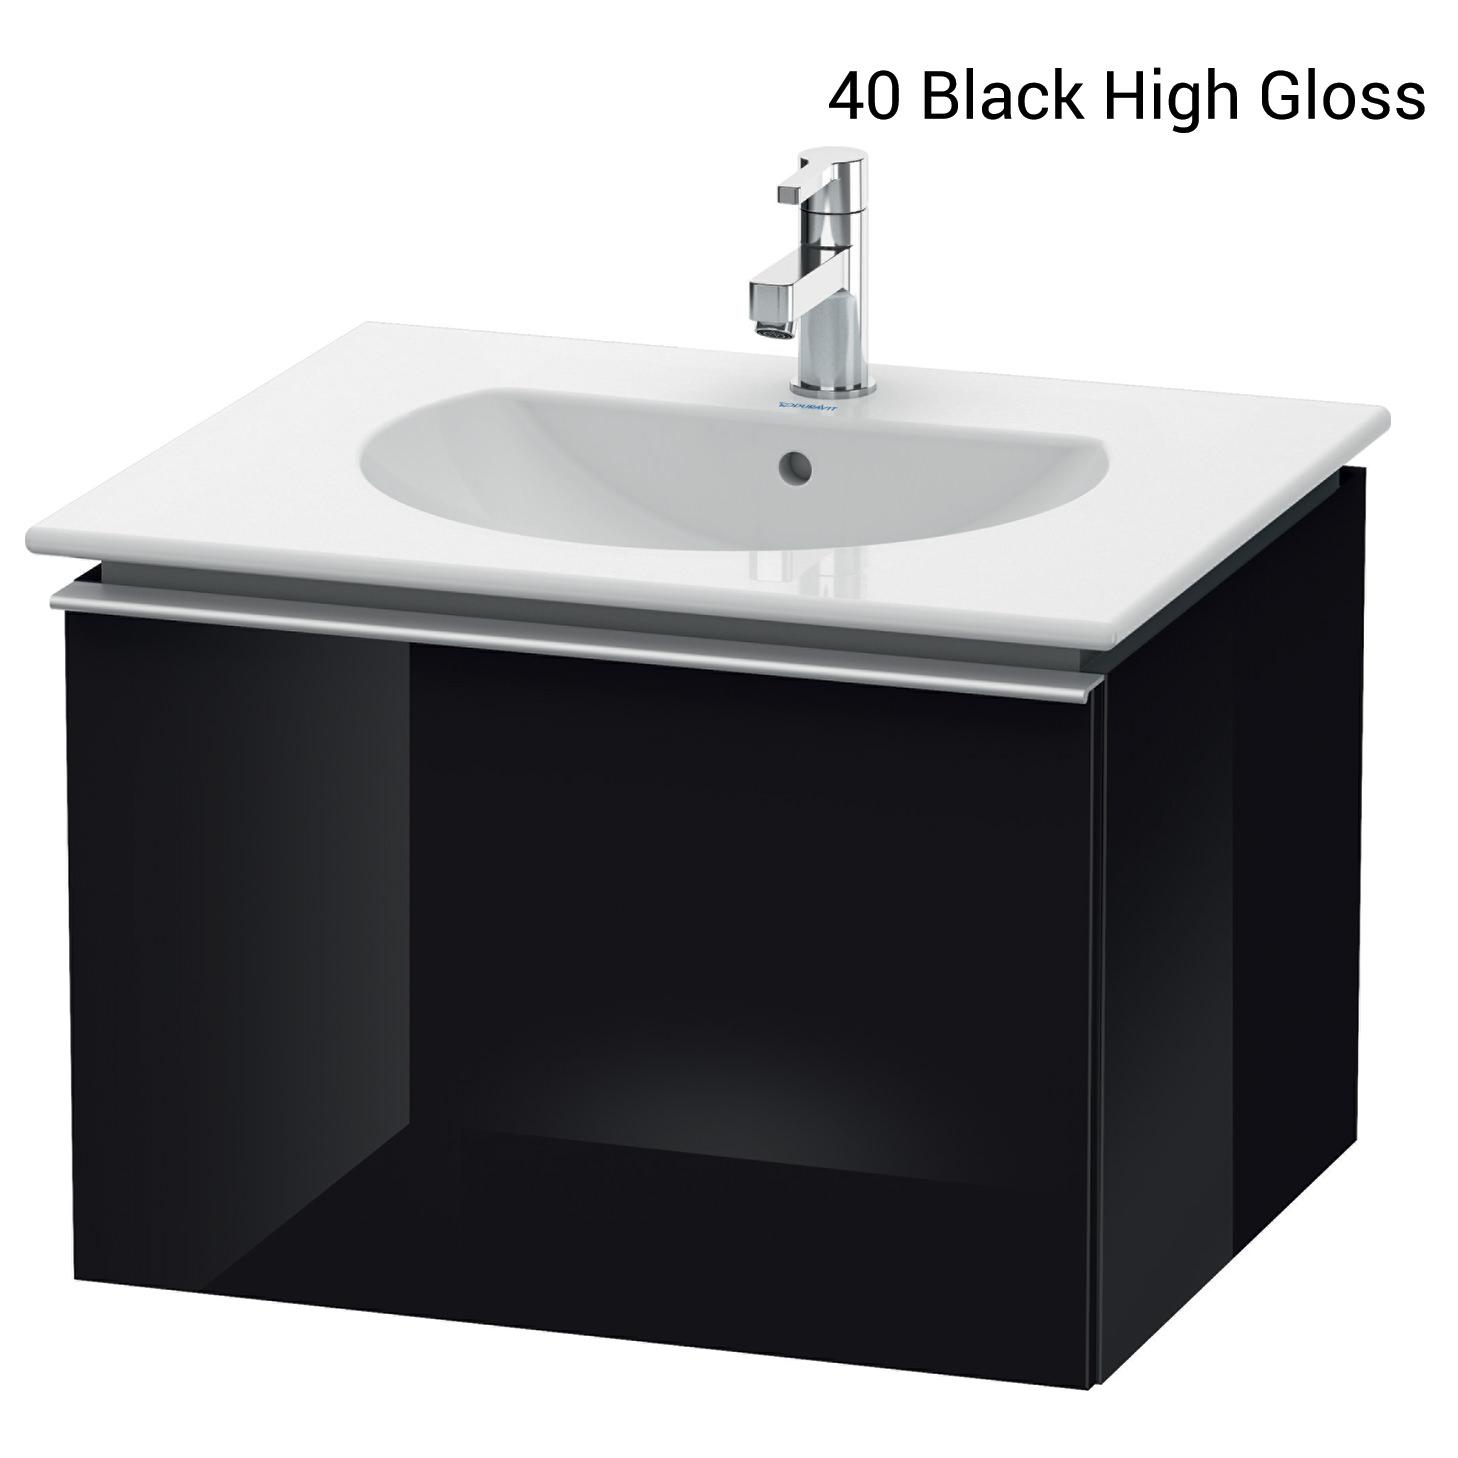 duravit darling new 545 x 600mm white matt vanity unit. Black Bedroom Furniture Sets. Home Design Ideas